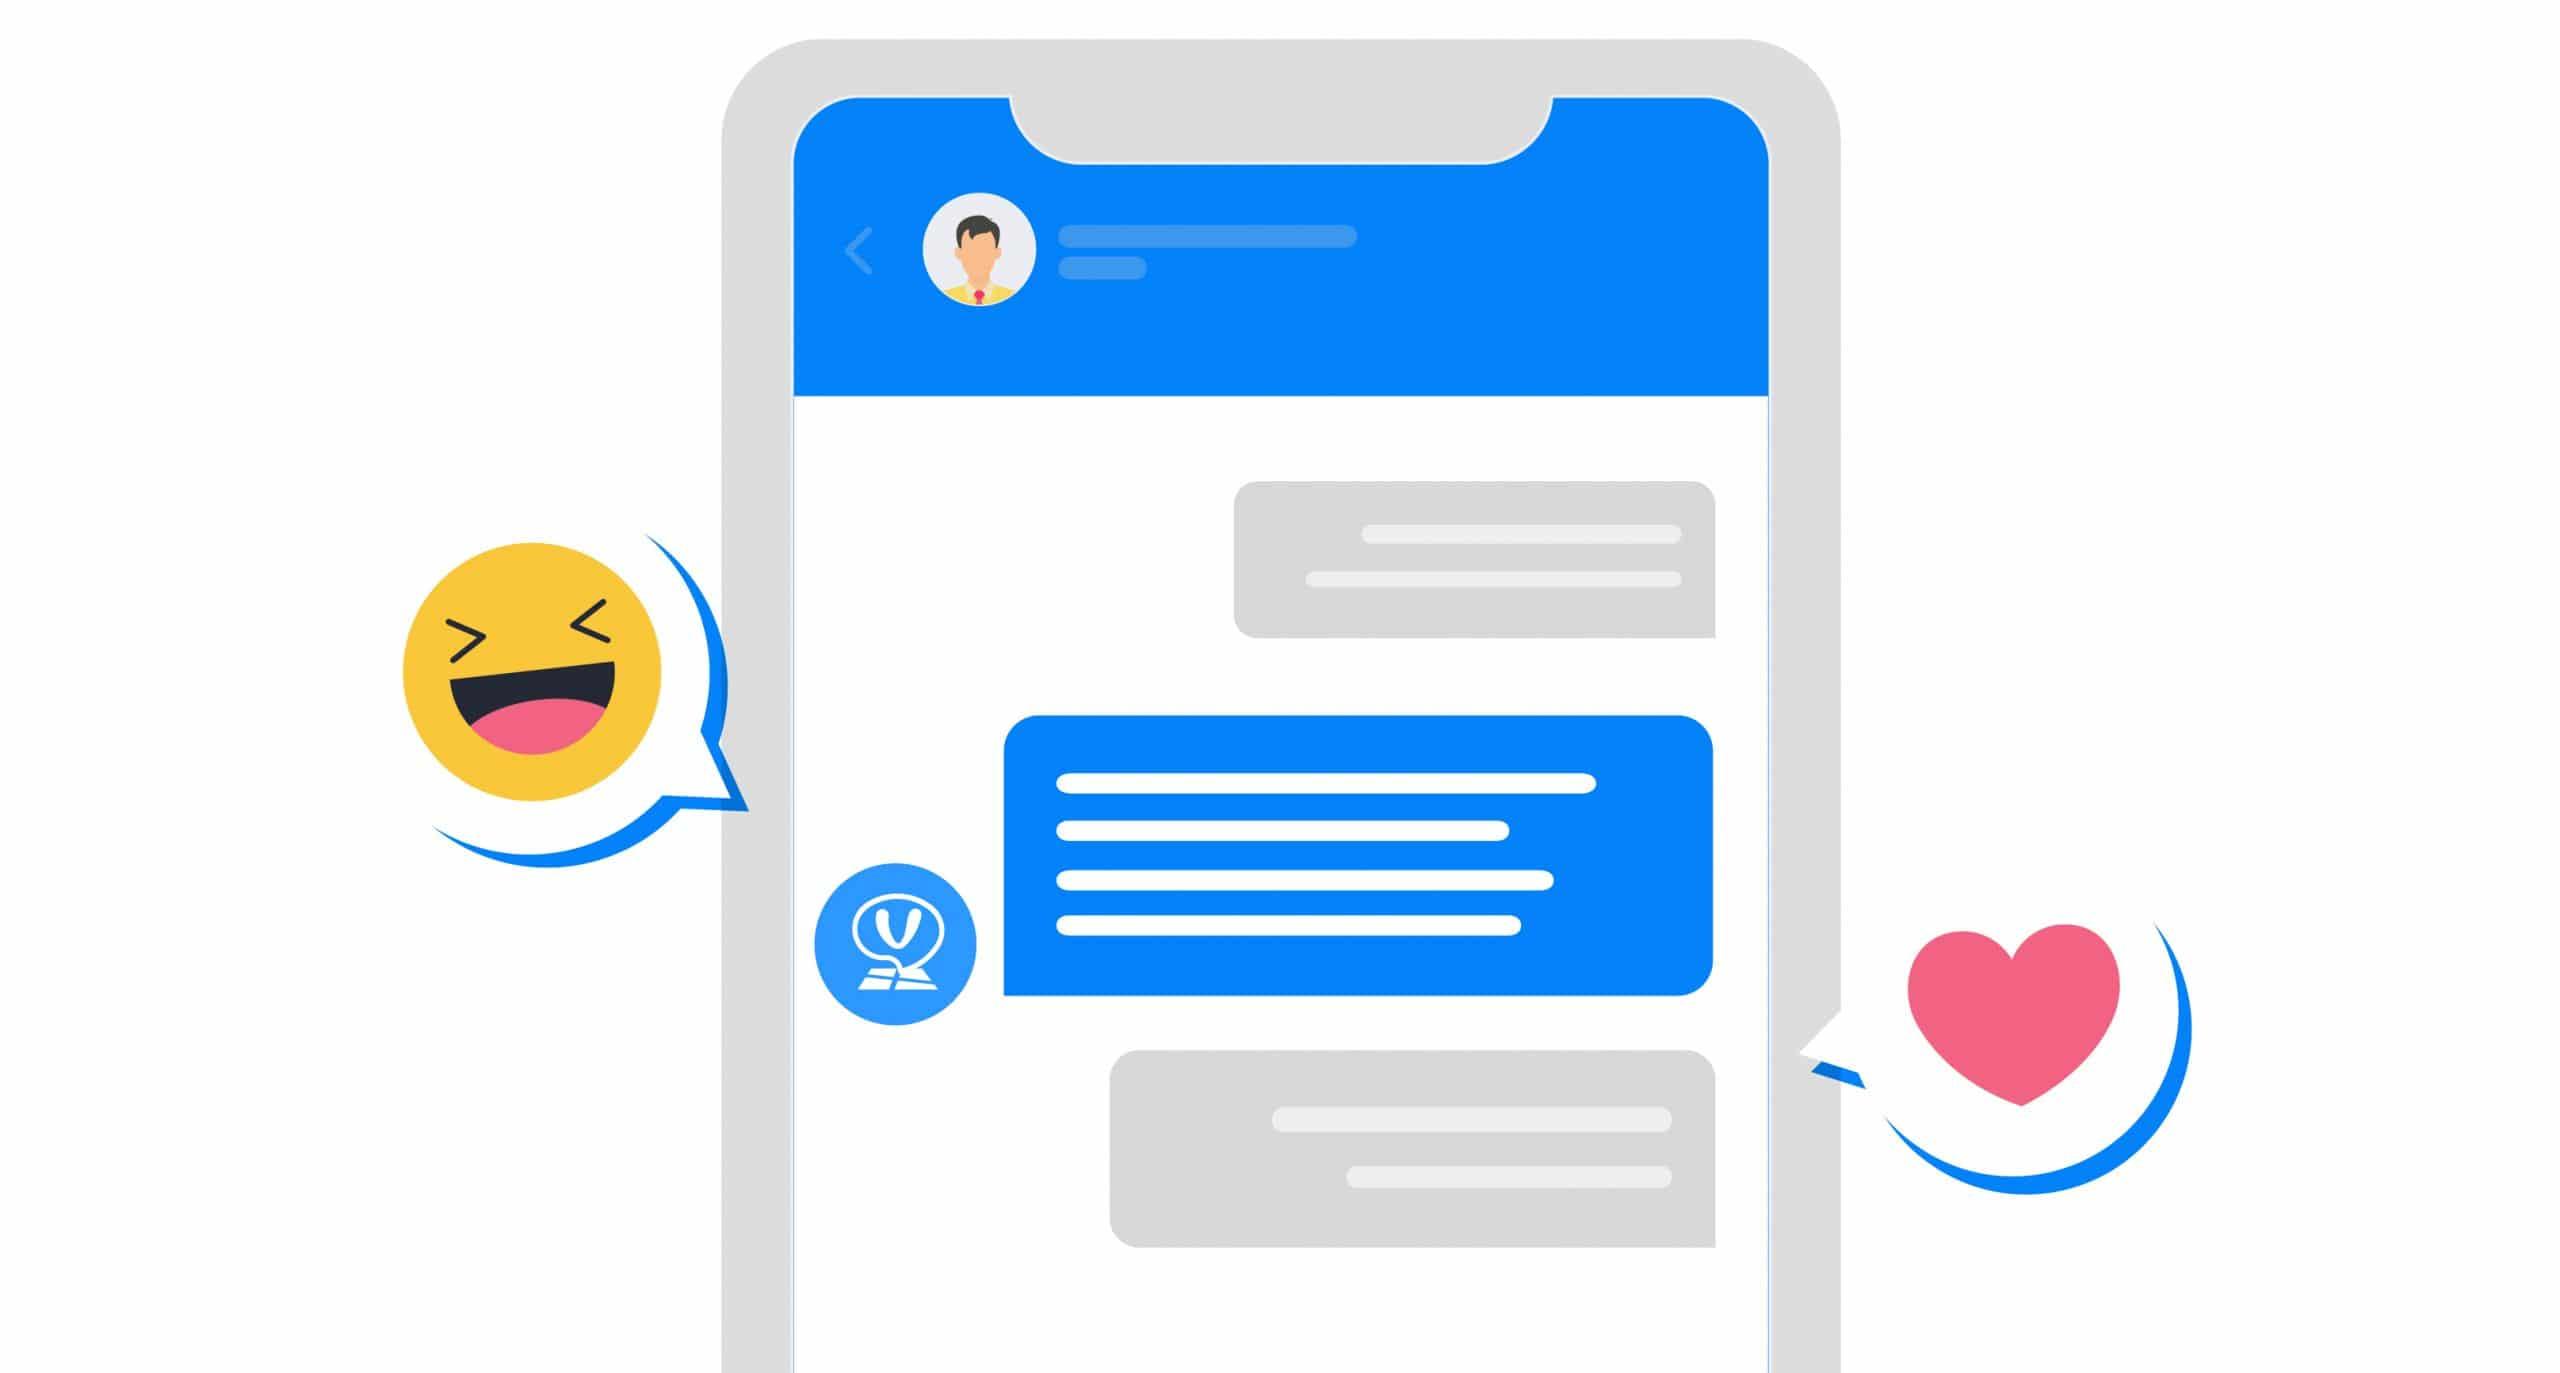 crm helps increase customer satisfaction